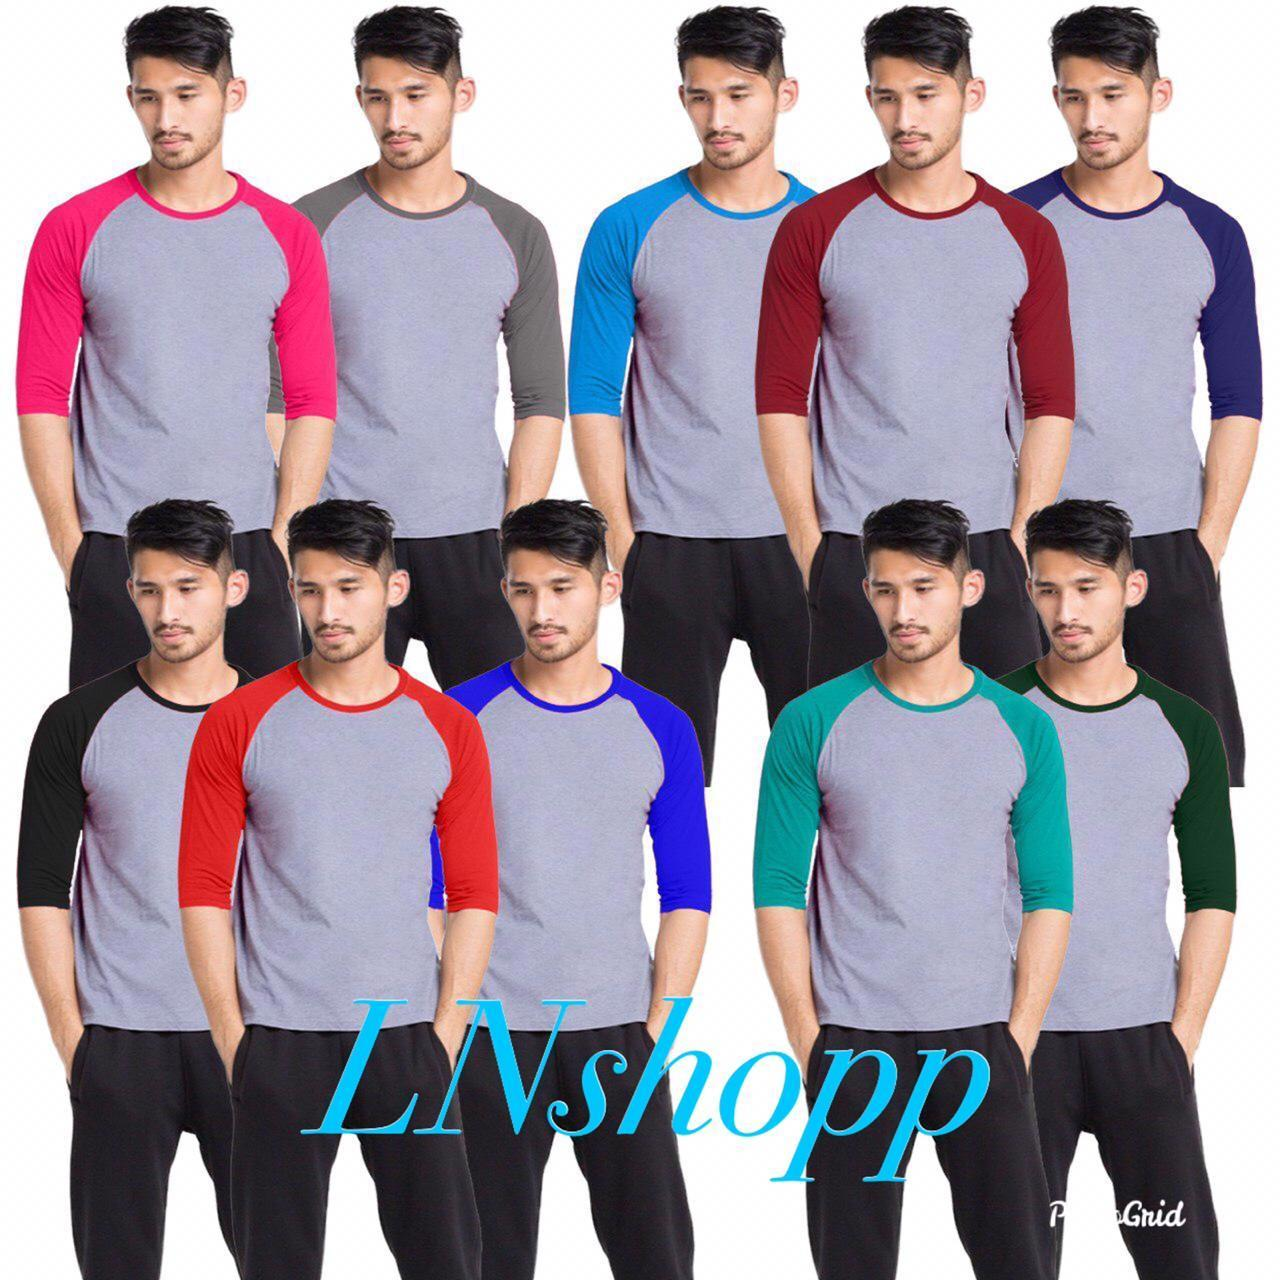 Kaos raglan polos lengan 3/4 Pria / fashion pria / baju raglan pria / kaos distro